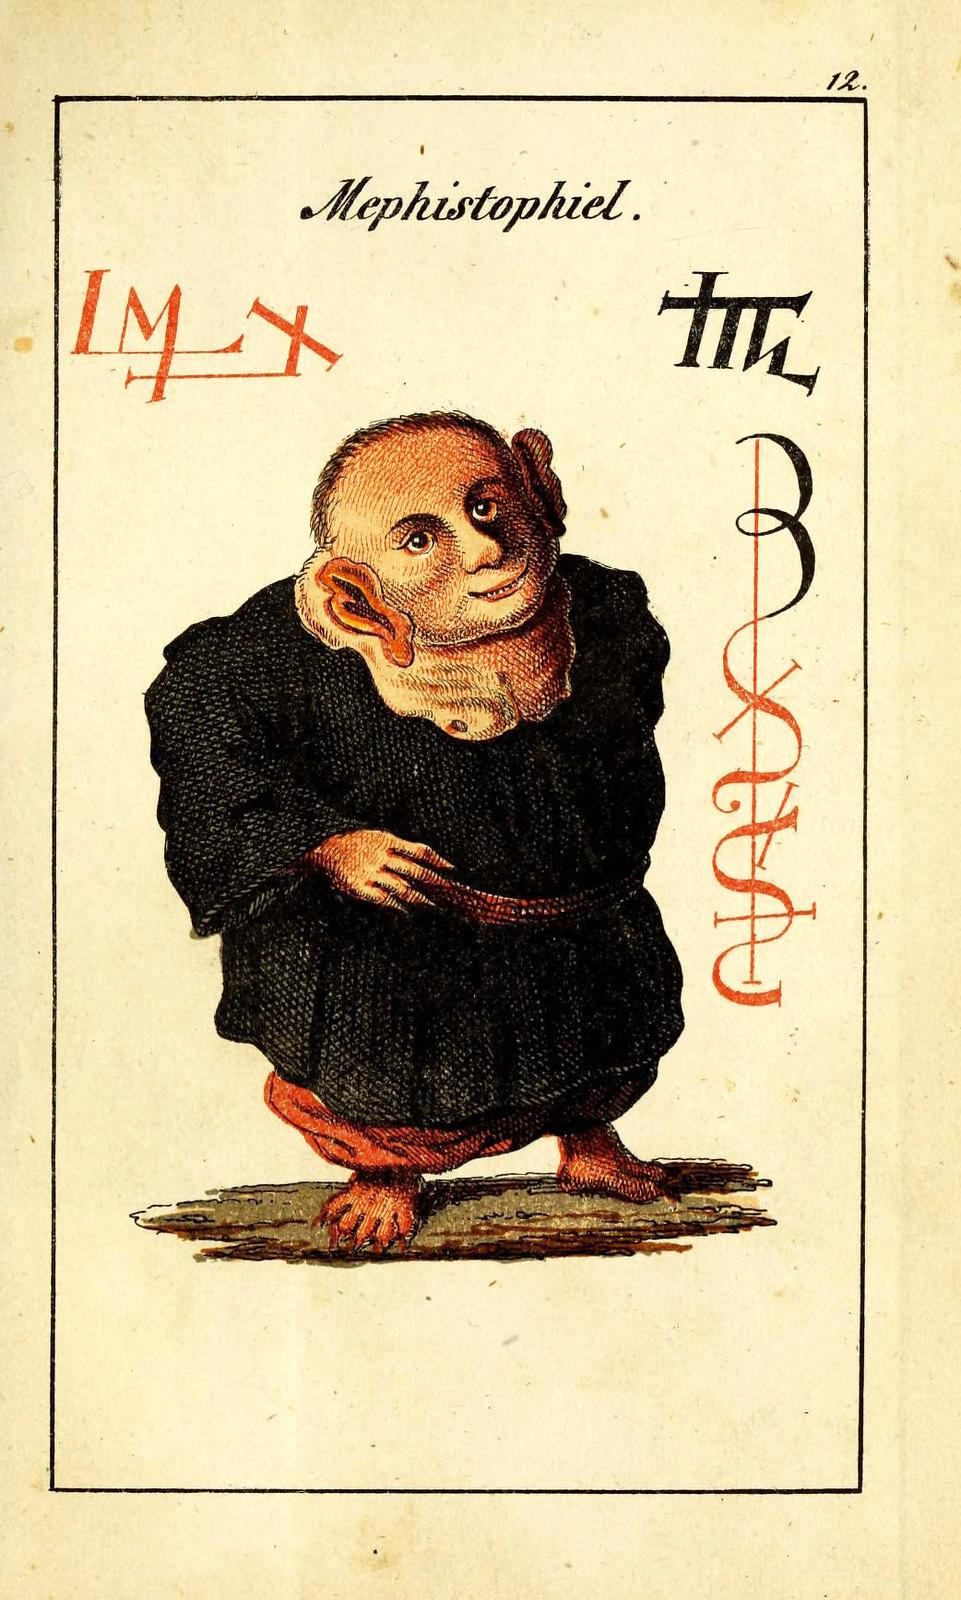 Johann Scheible - Doktor Johannes Faust's Magia naturalis et innaturalis, 1849 (16)